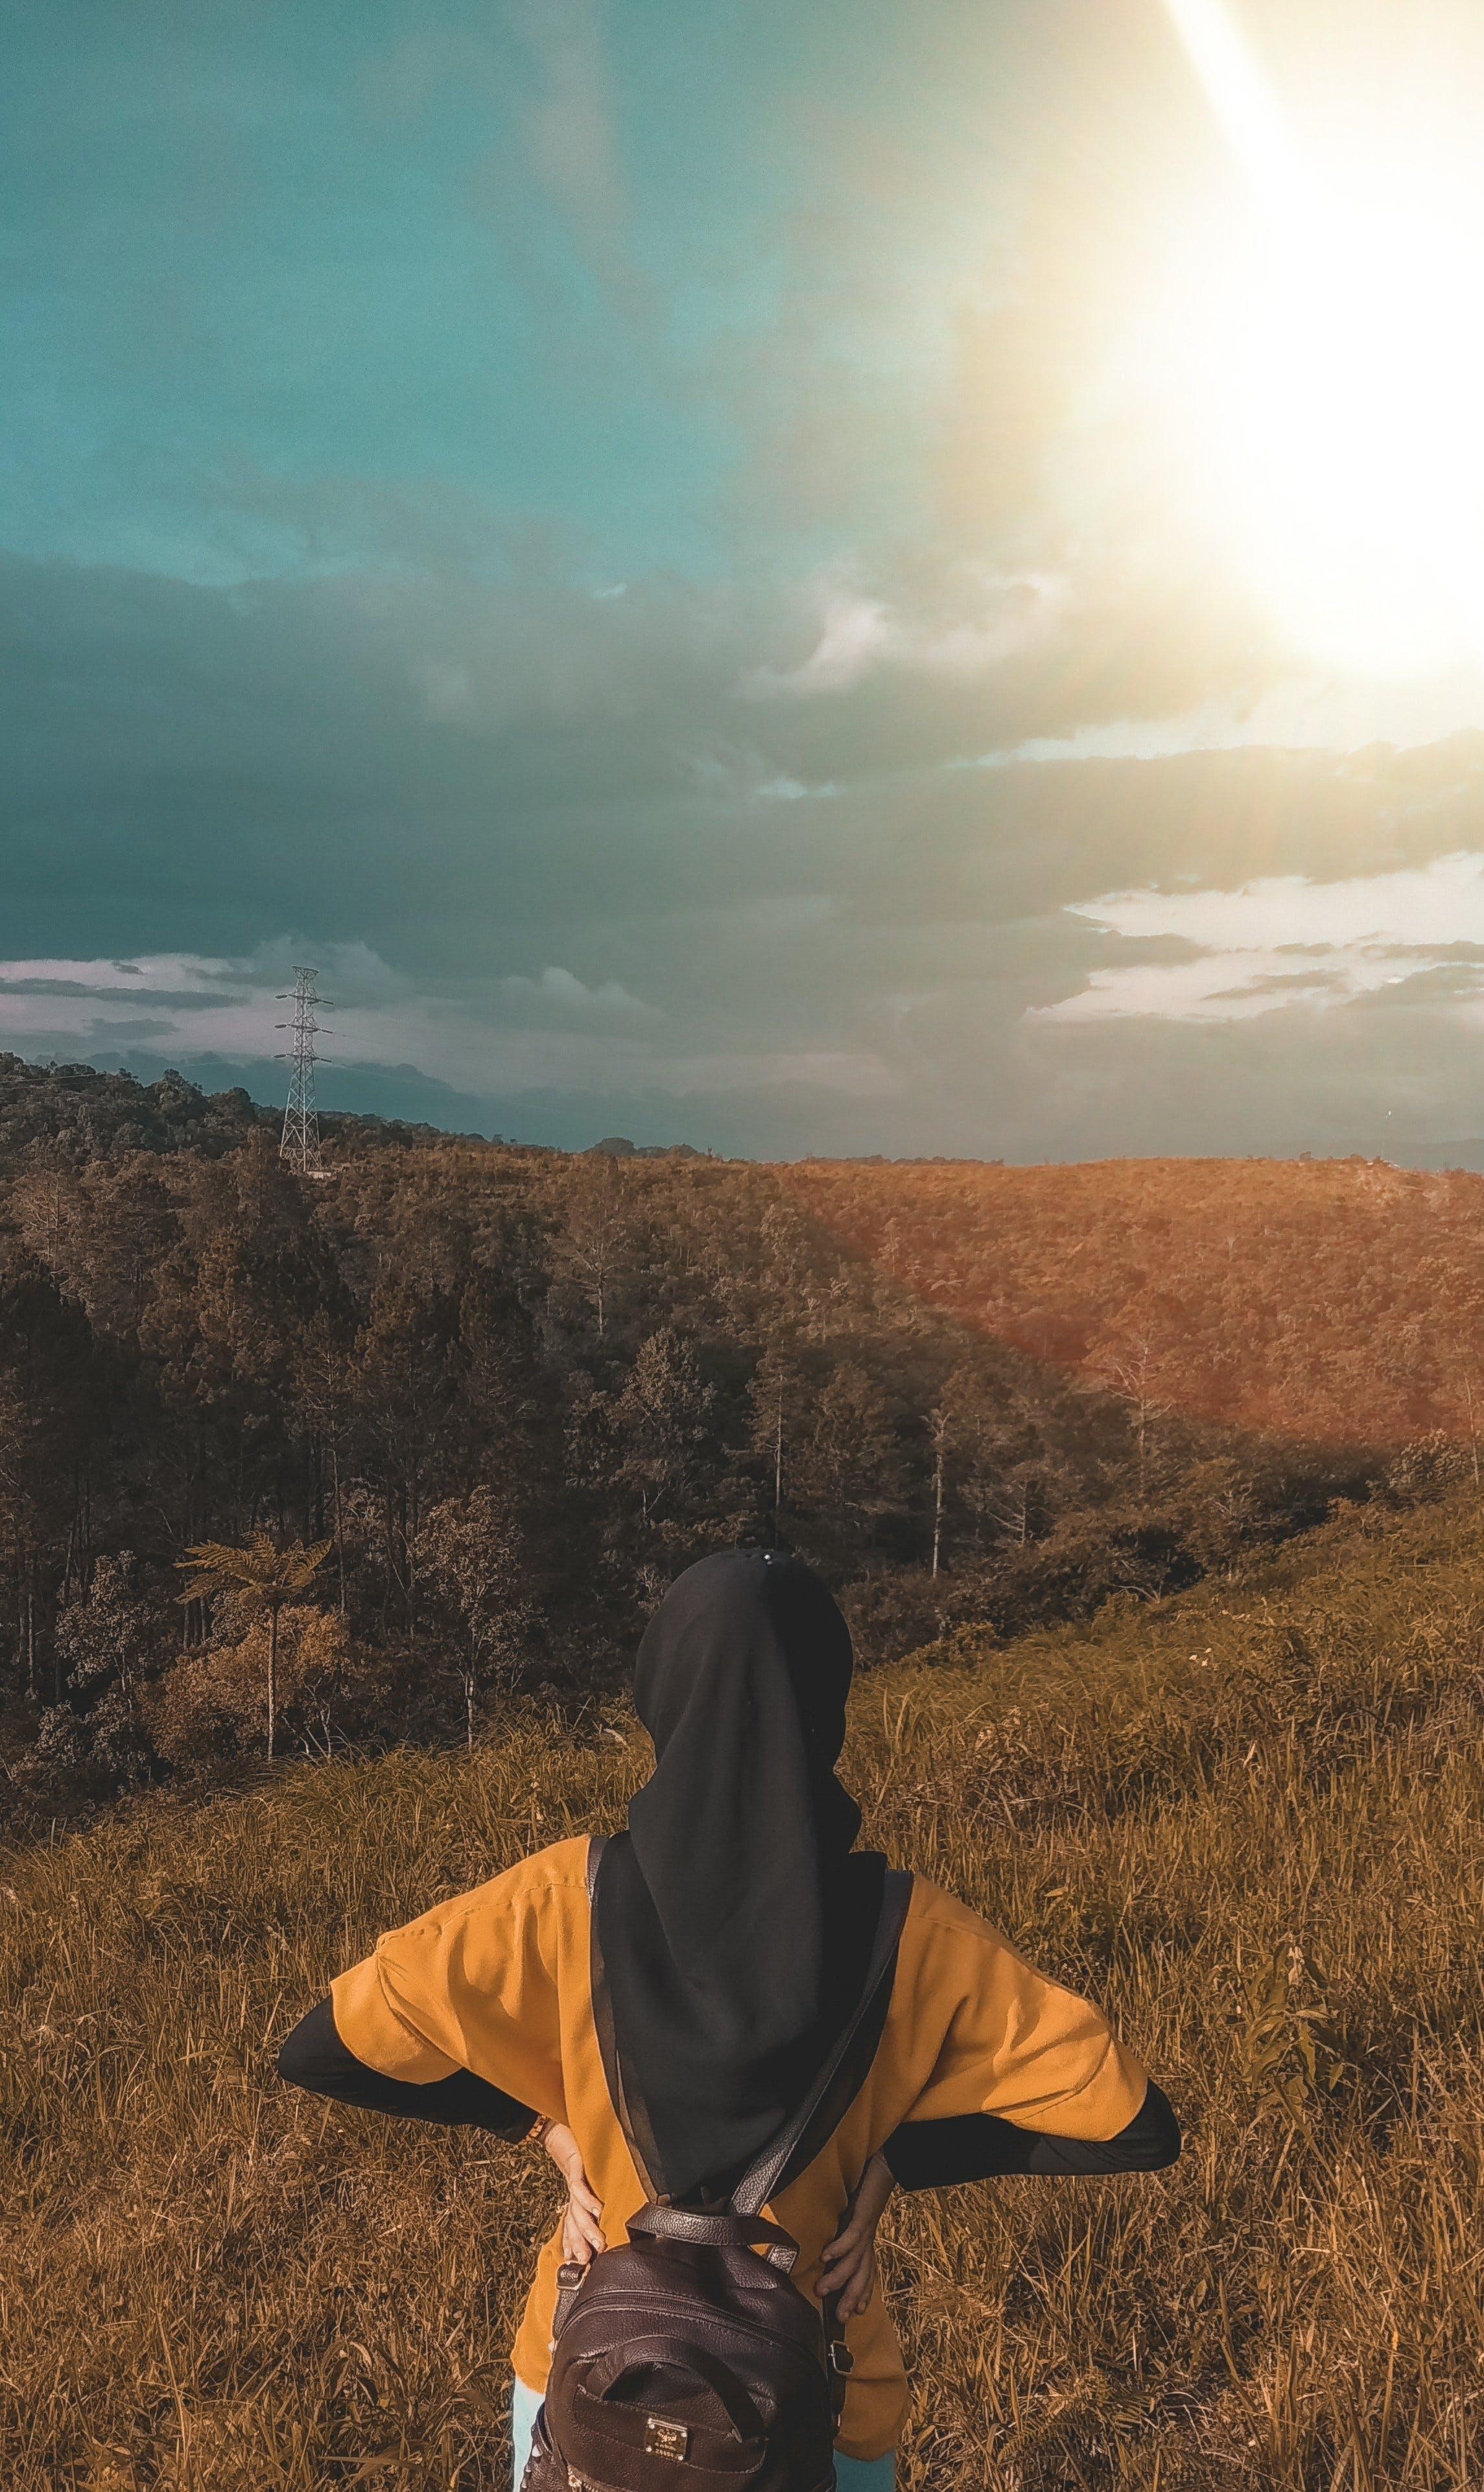 Woman Wearing Black Headdress on Top of Mountain